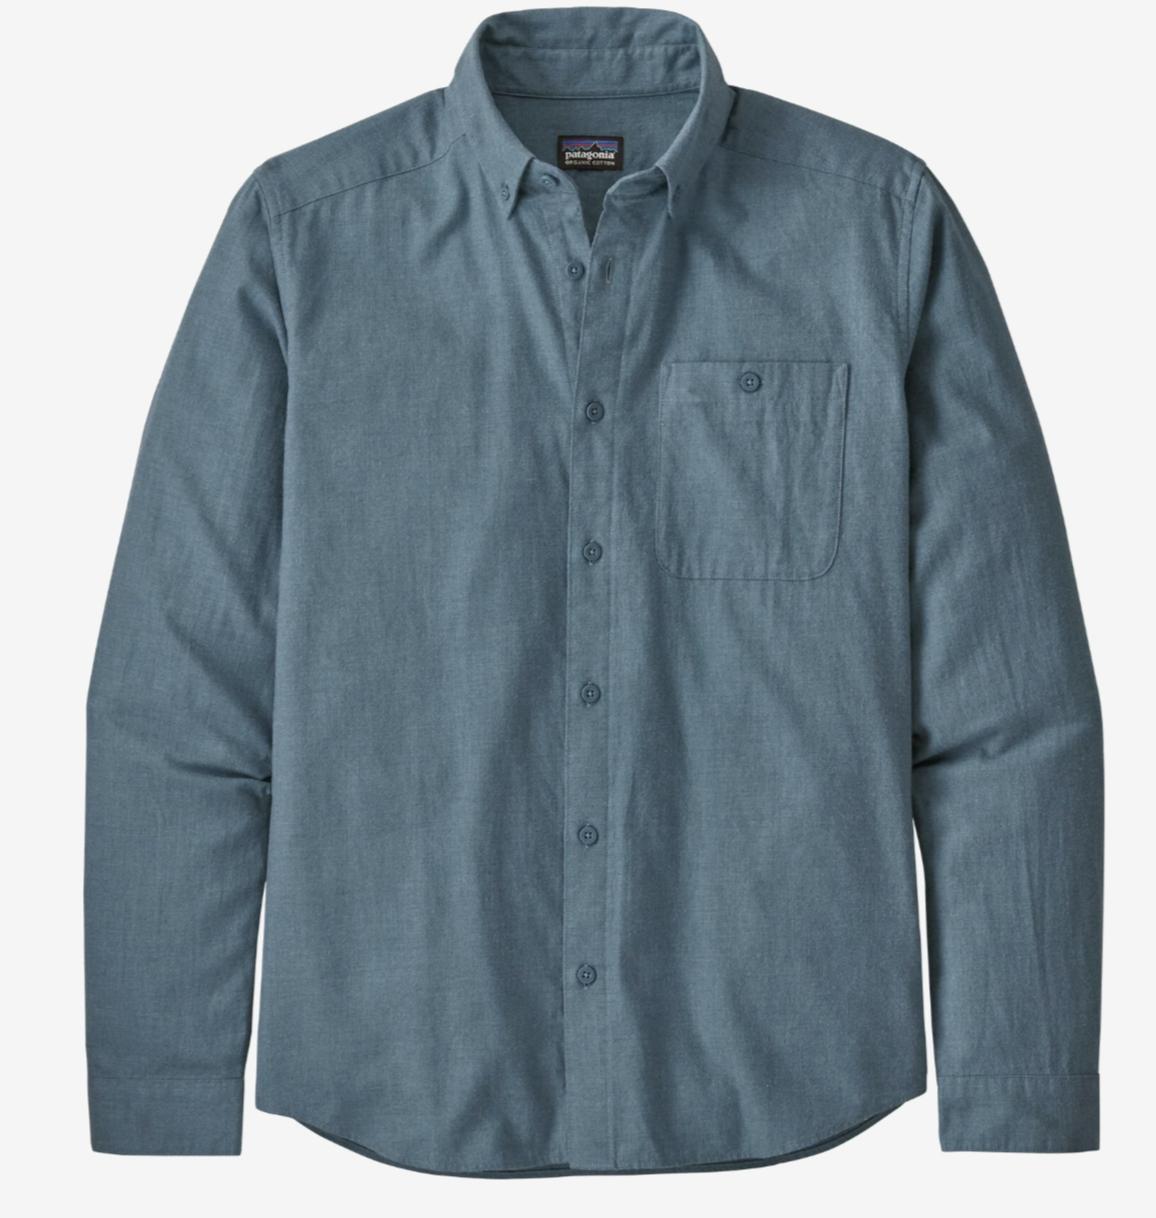 Patagonia Long Sleeve VJosa River Pima Cotton Shirt